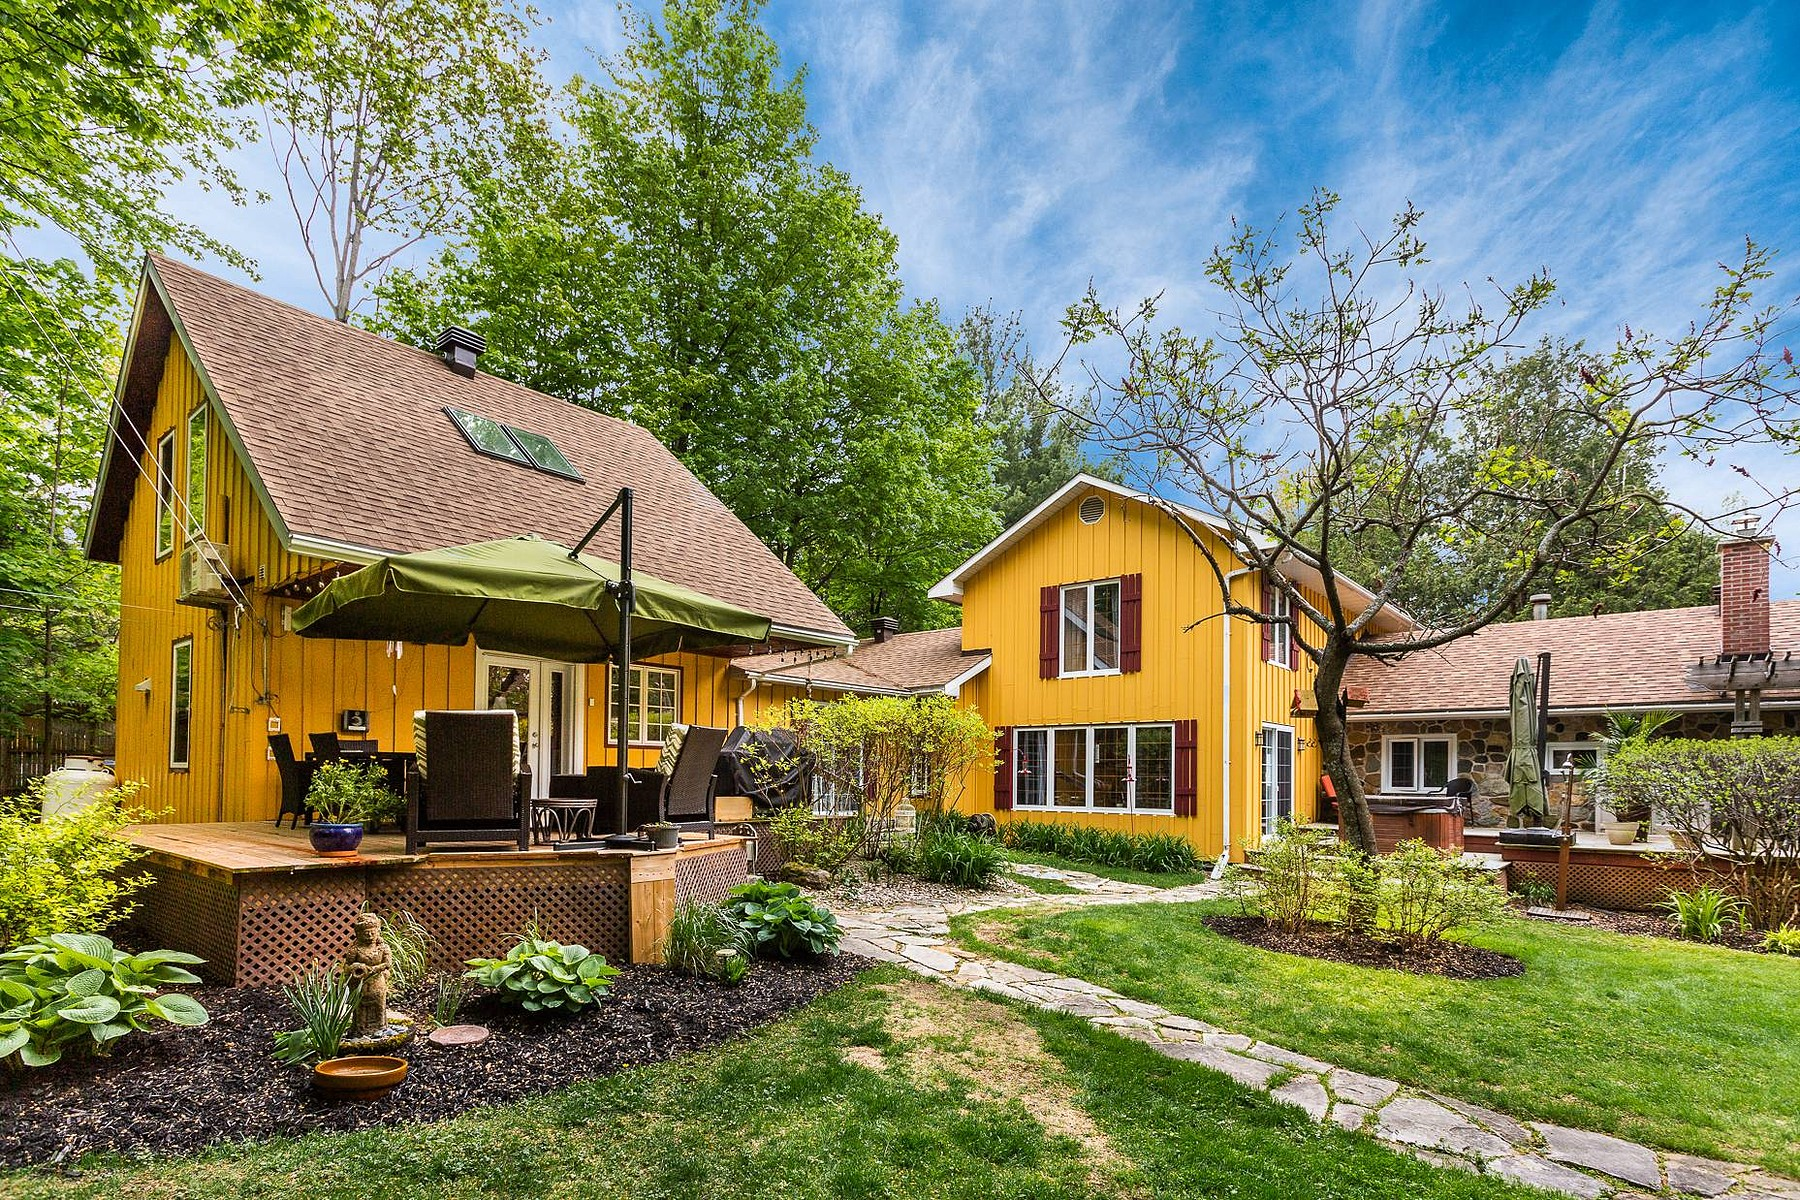 Single Family Homes for Sale at Un Gîte ou B&B. 1208 Rue Shefford Bromont, Quebec J2L1C8 Canada